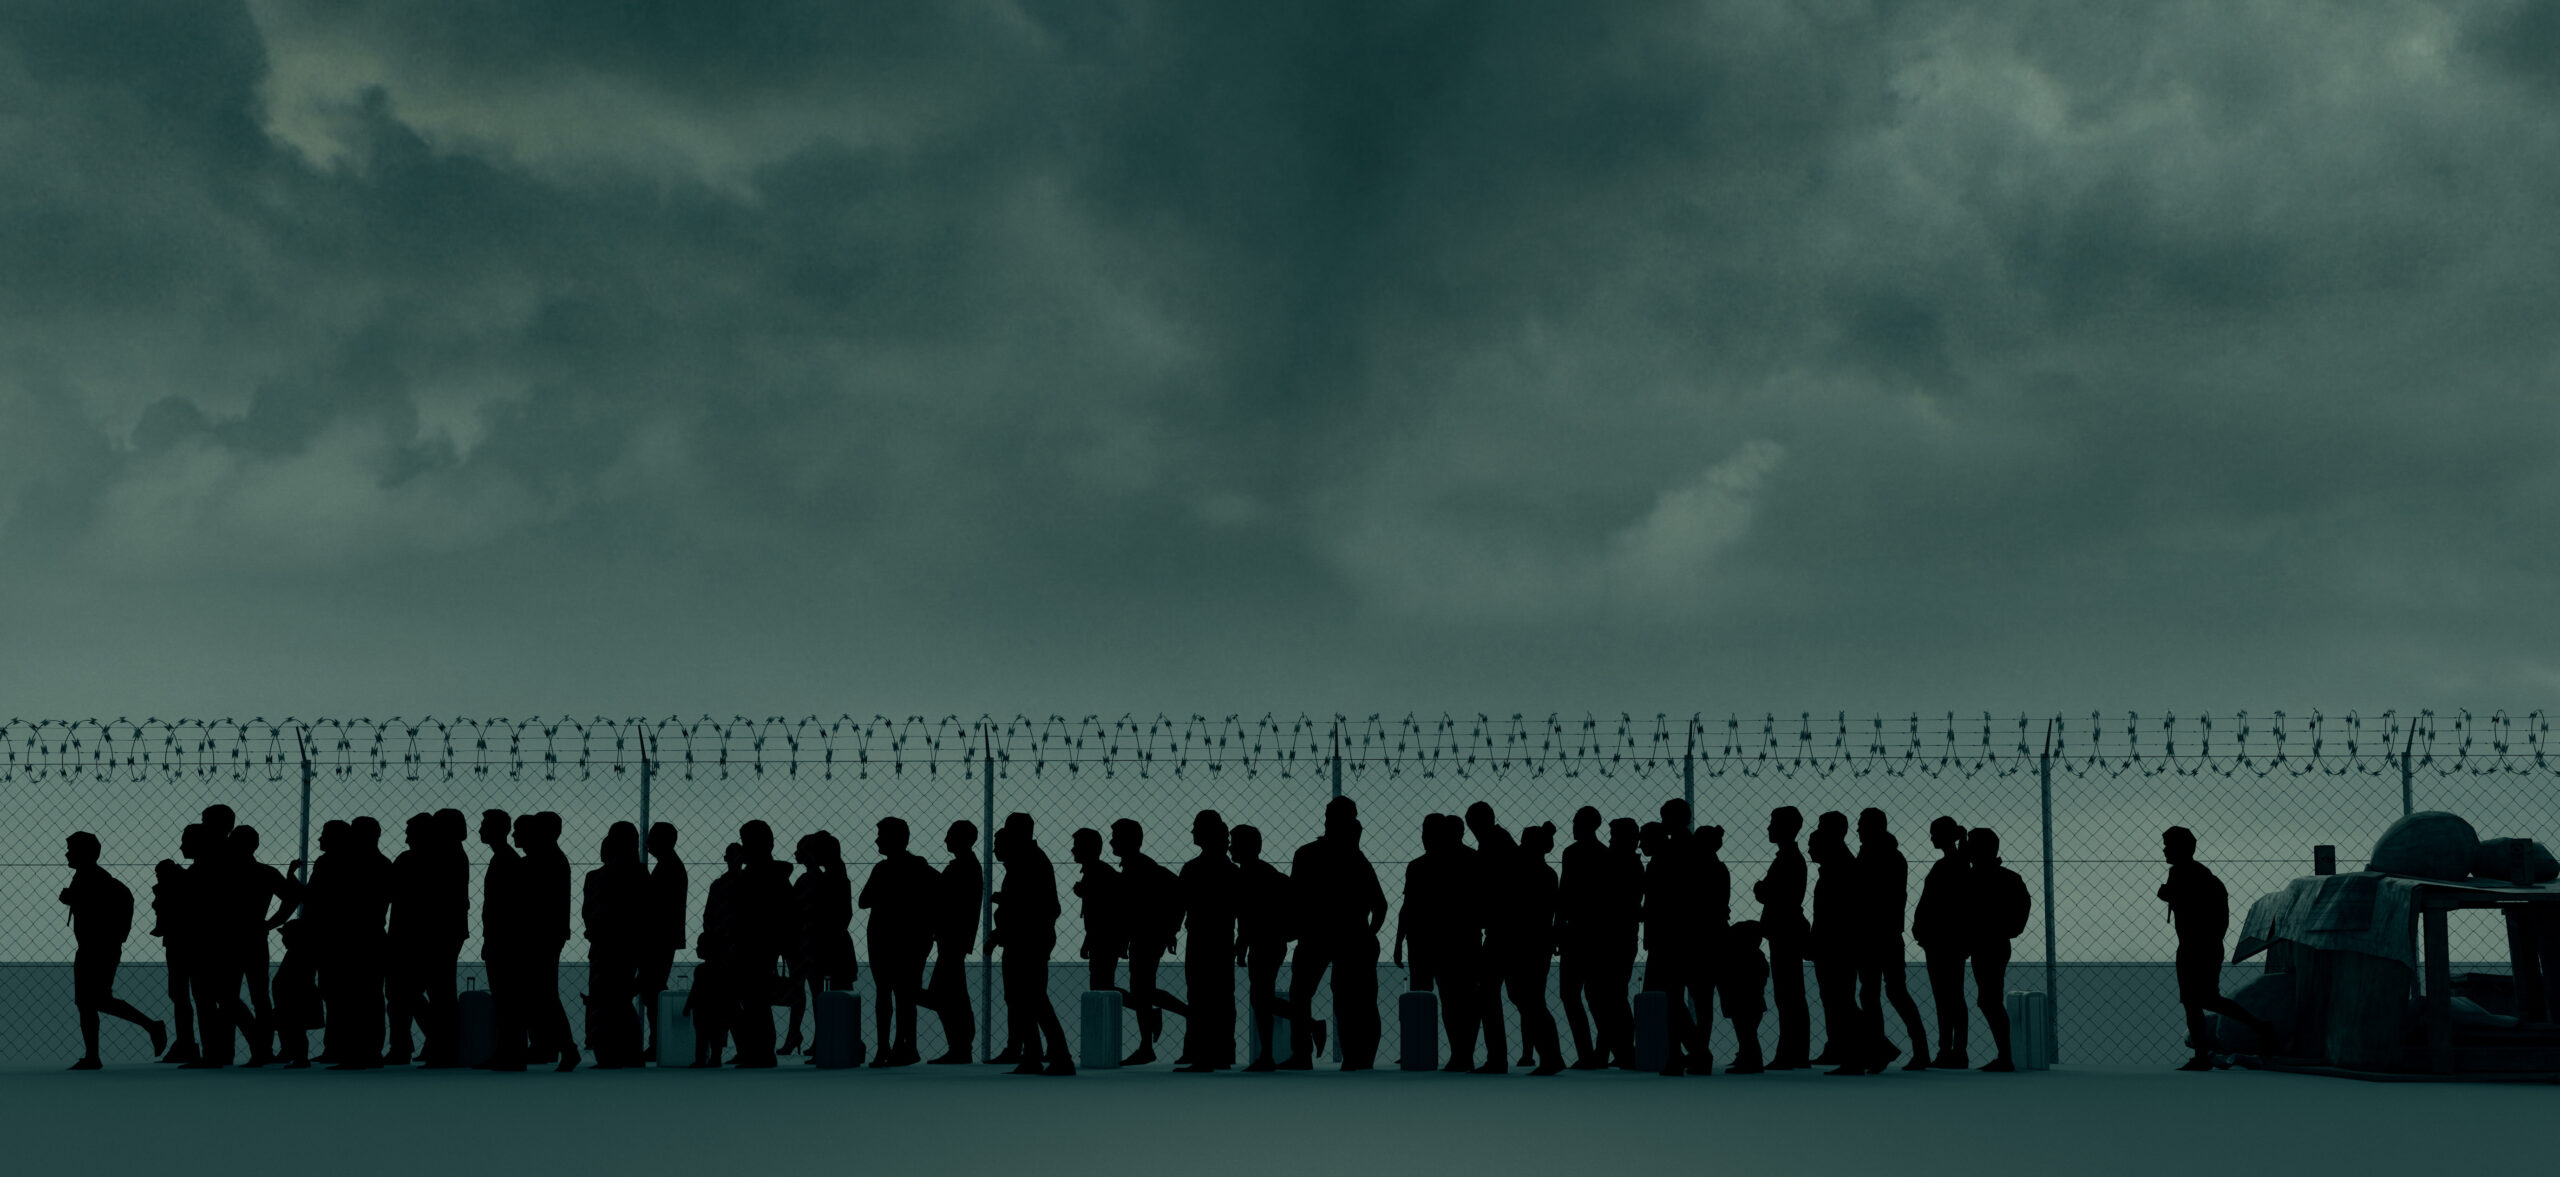 Pandemic + Border Crisis = Chaos 🌪️